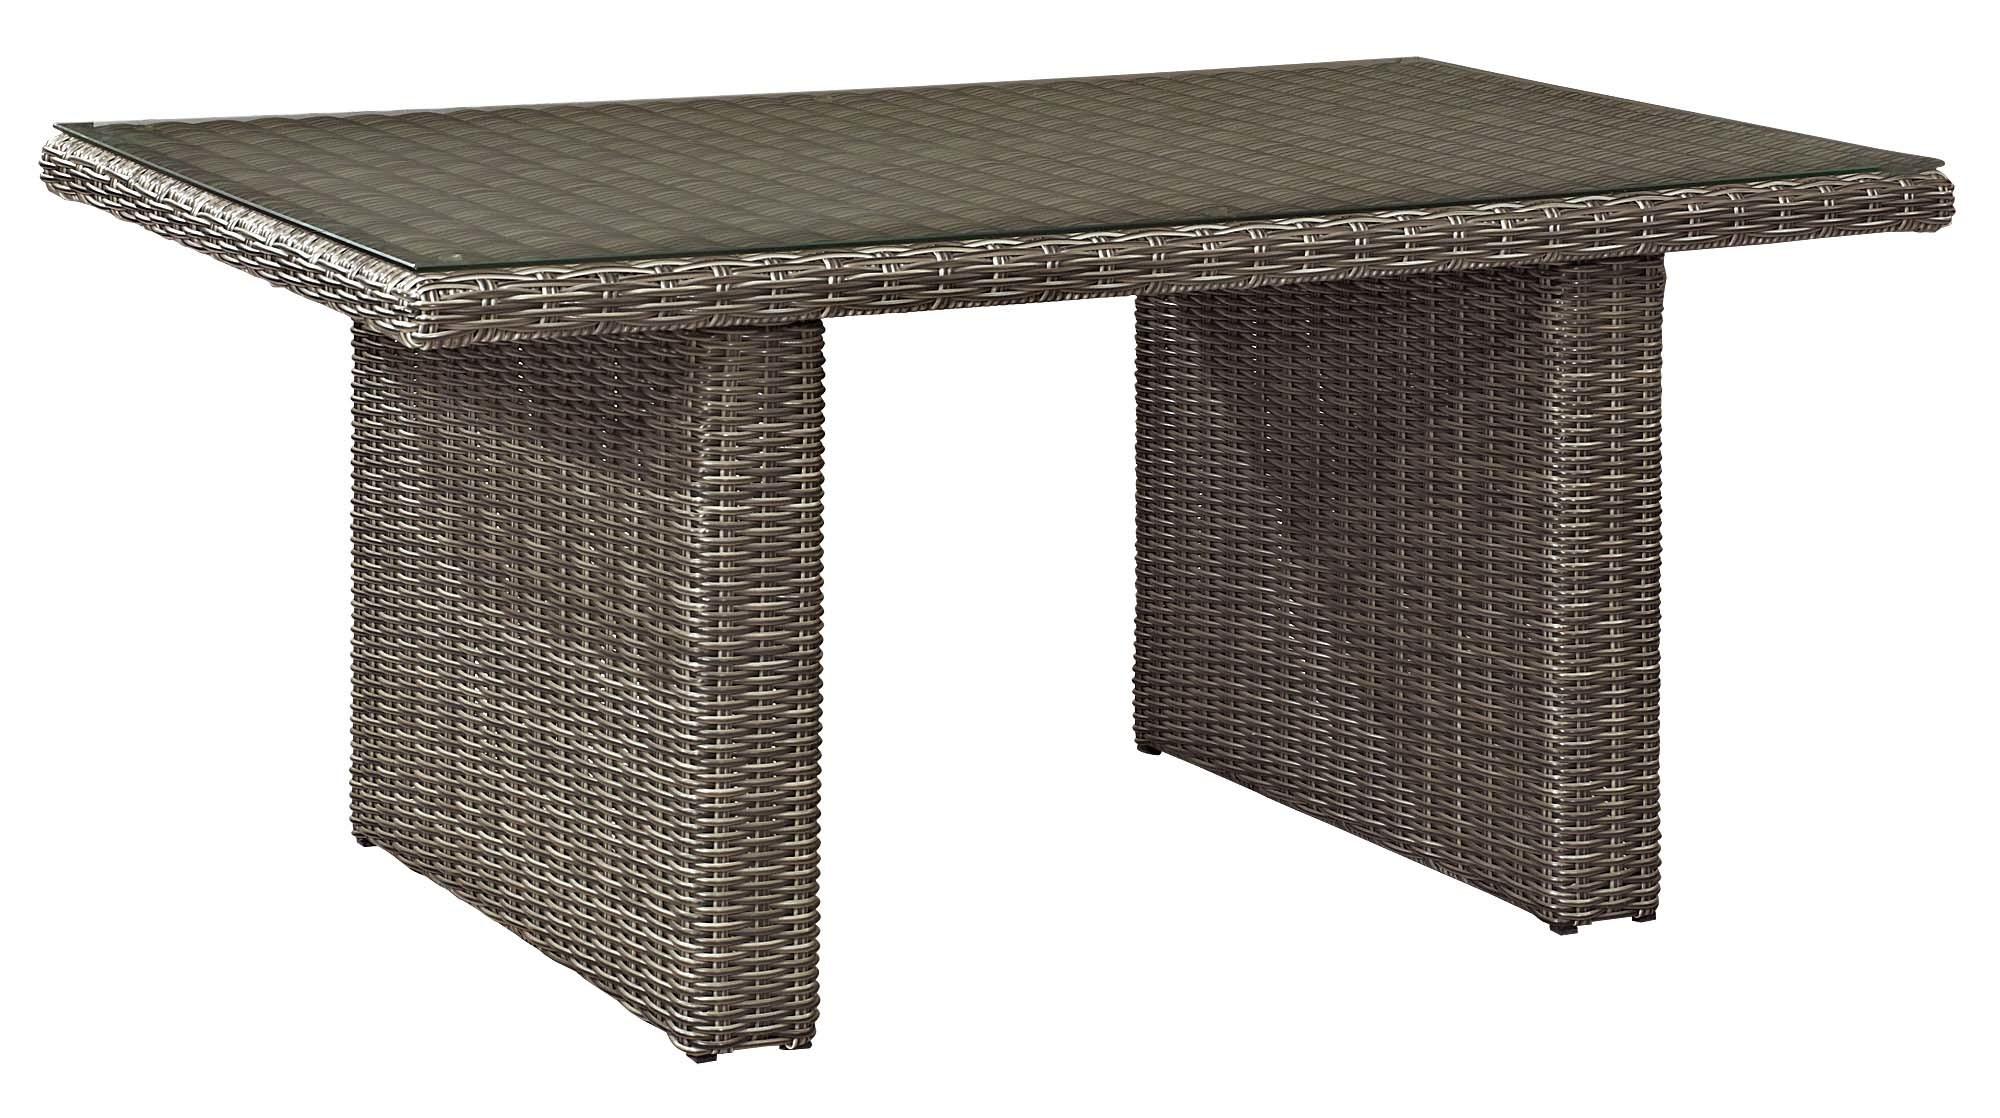 2015 Polyrattan Outdoor Furniture Sofa Set for Rattan Furniture